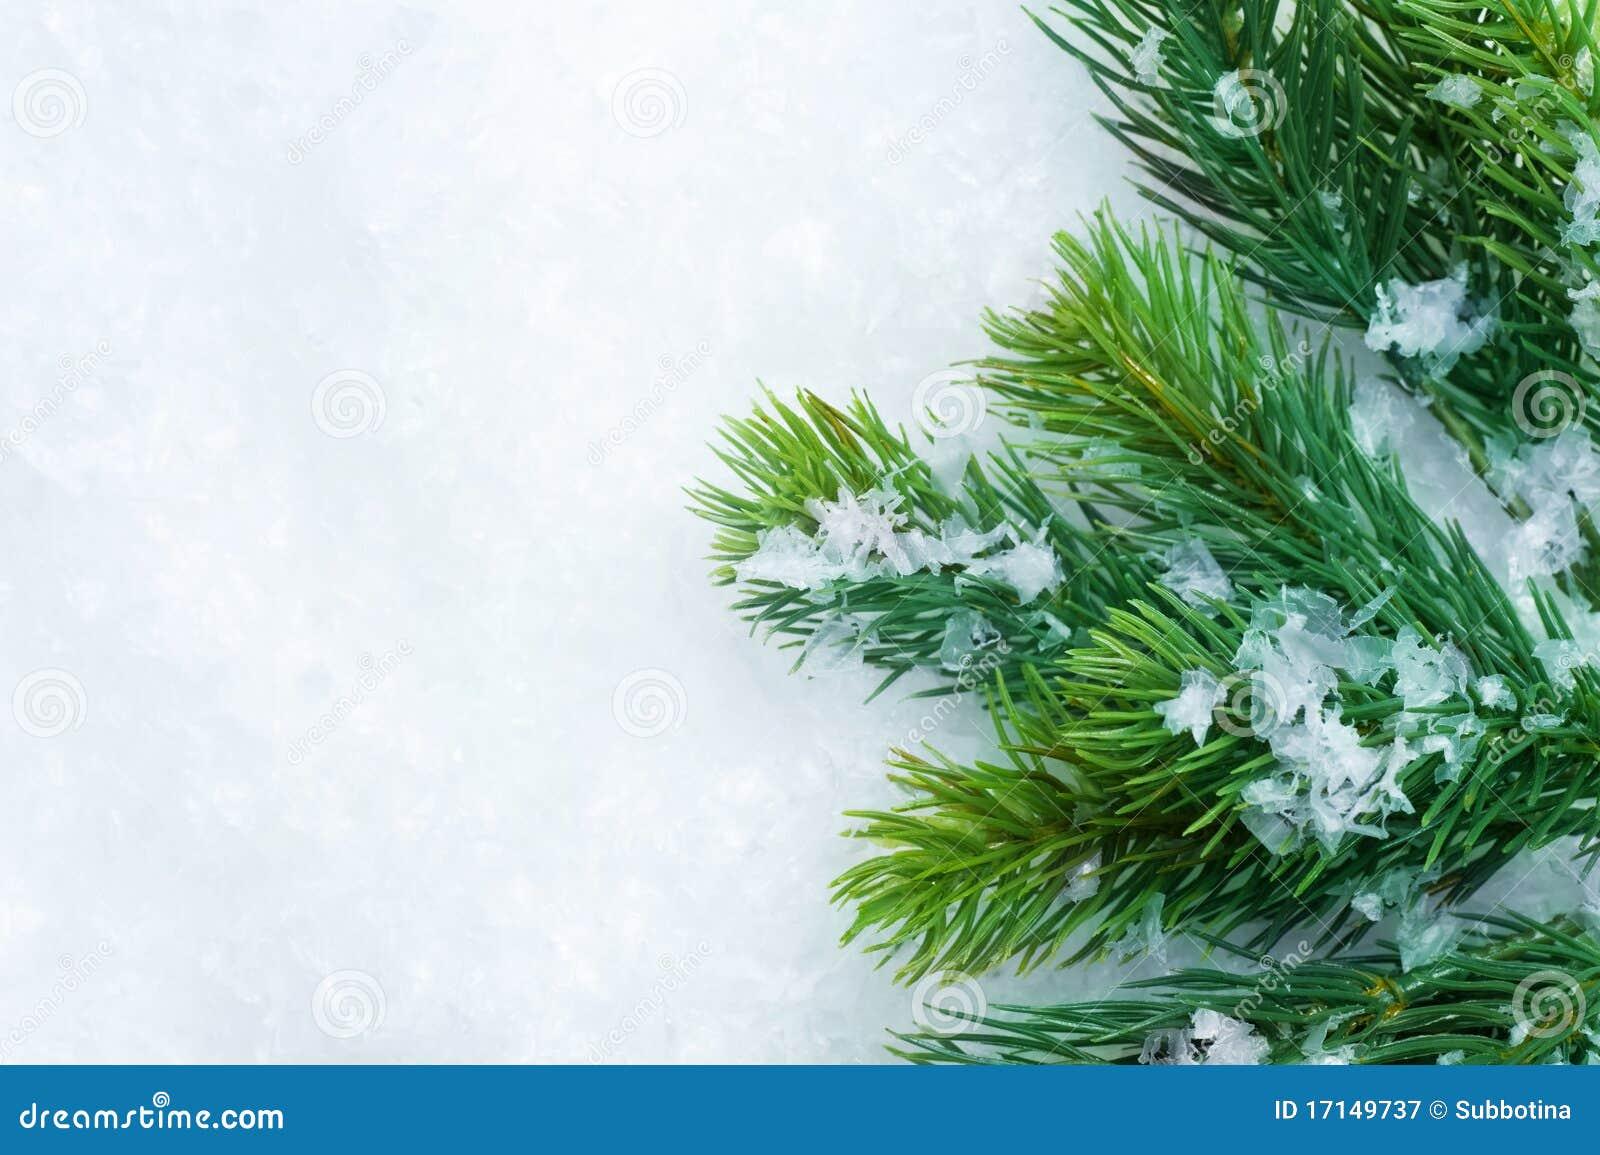 Christmas Tree Border Royalty Free Stock Photography ...